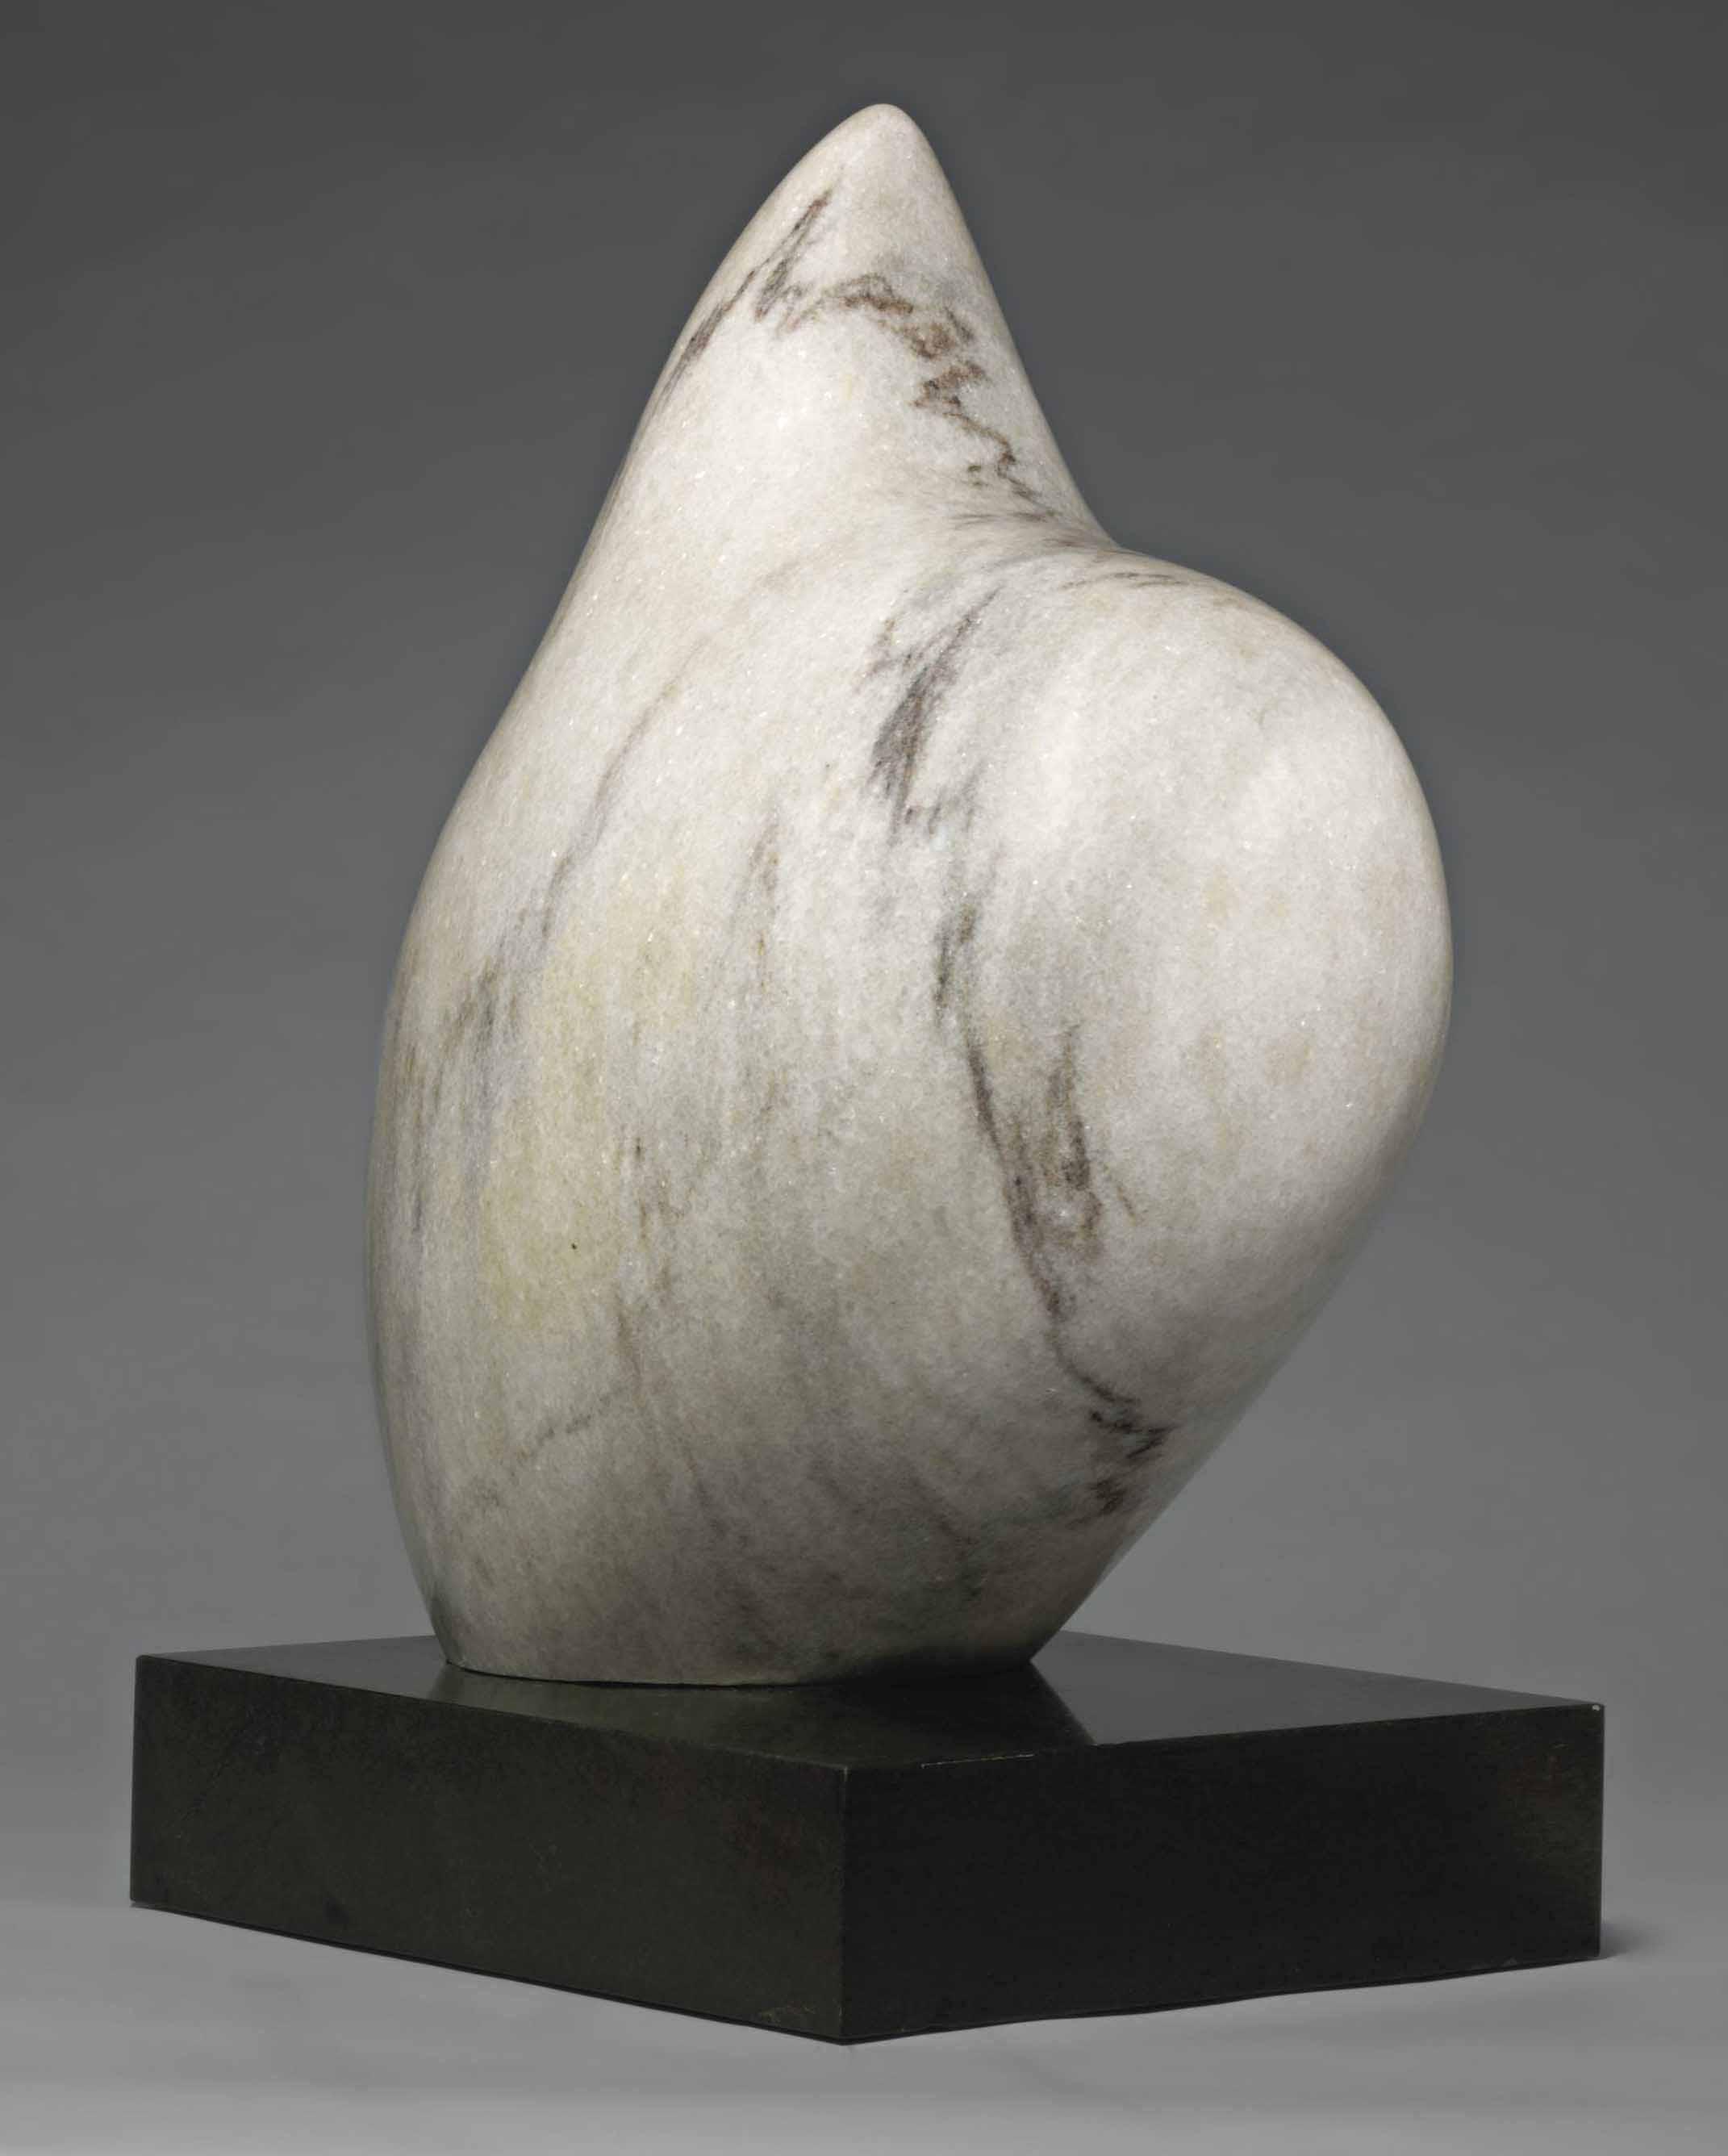 JEAN (HANS) ARP (1887-1966)